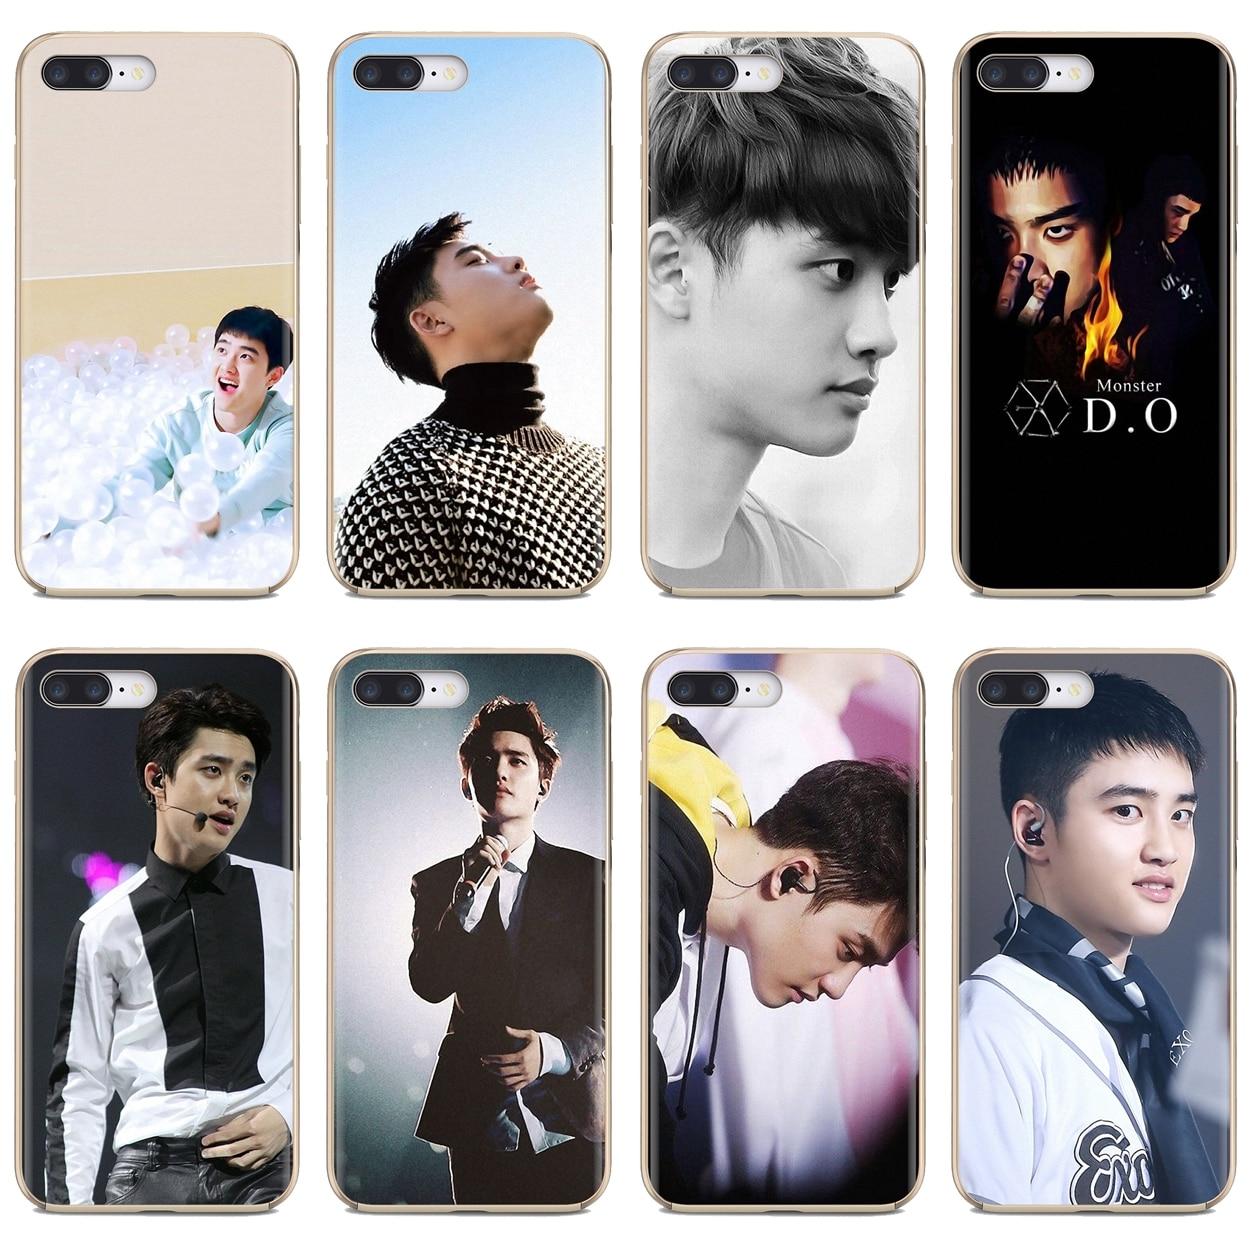 Cubierta de teléfono de silicona delgada de TPU suave D.O. kyungsoo Exo Kpop para BQ Aquaris C U2 U V X2 X Lite Pro Plus E4.5 M4.5 X5 E5 4G M 2017